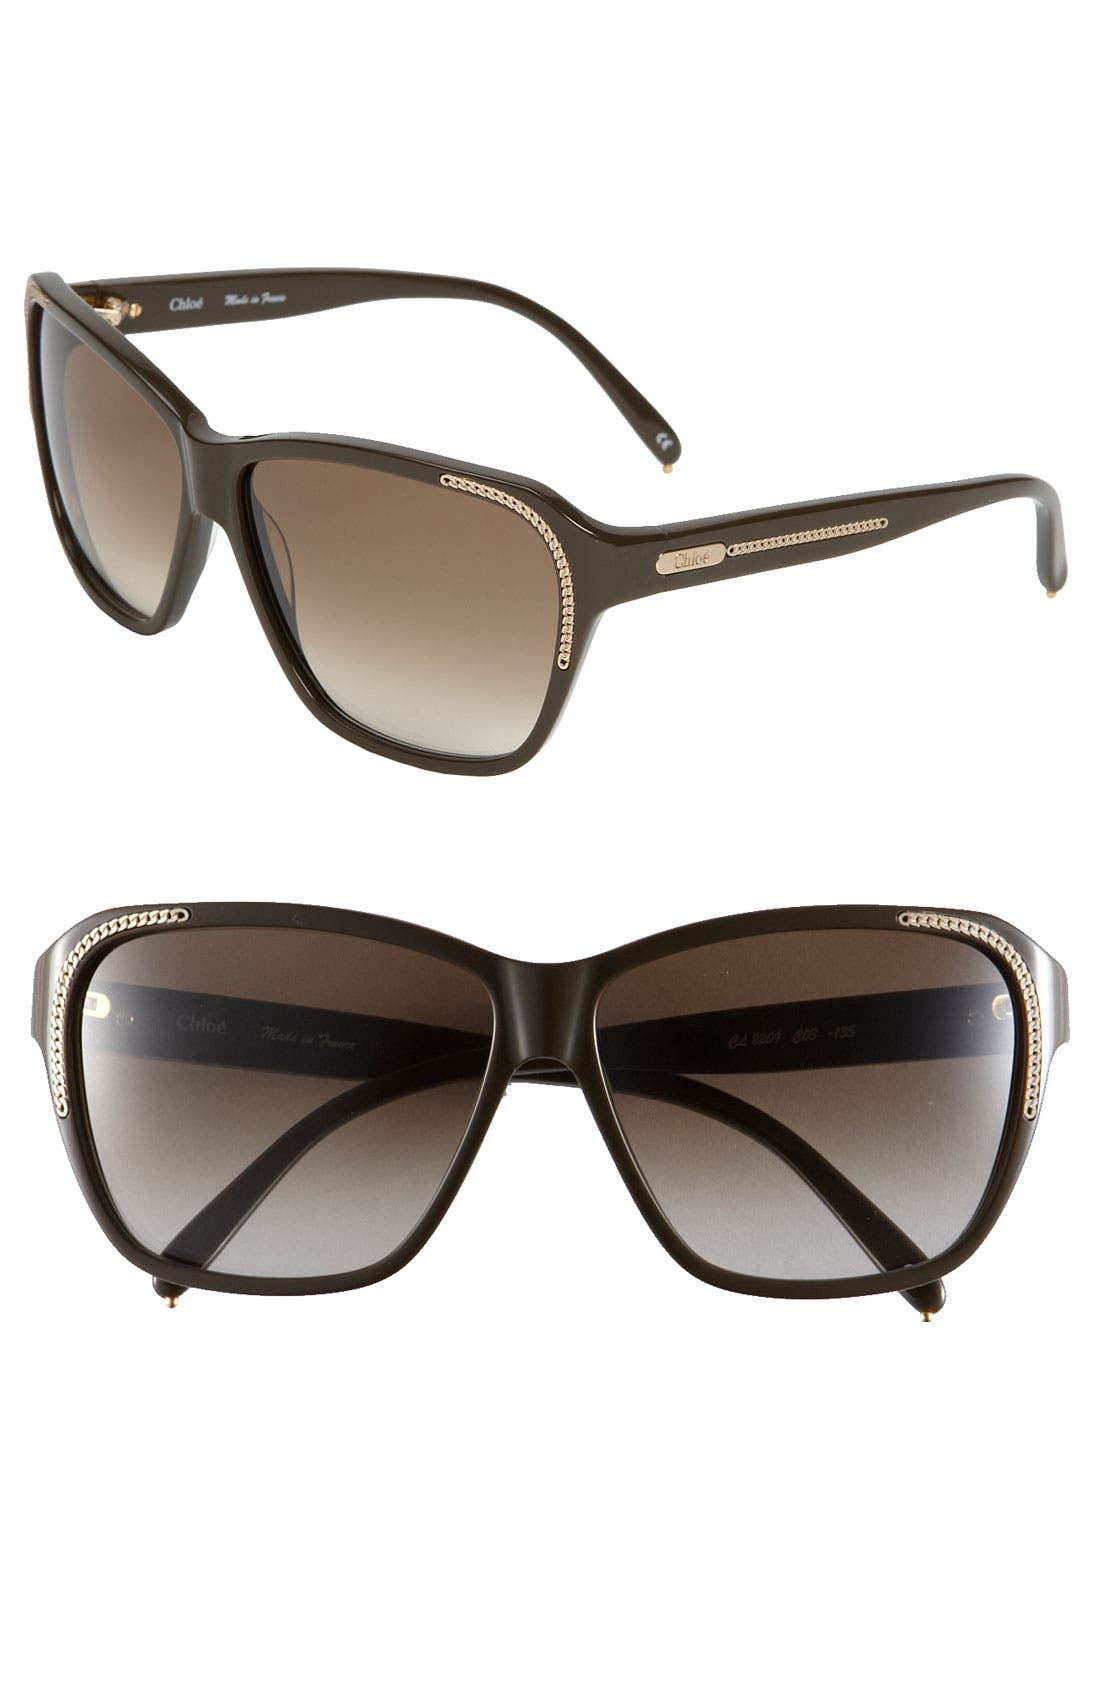 Main Image - Chloé '2209' Sunglasses